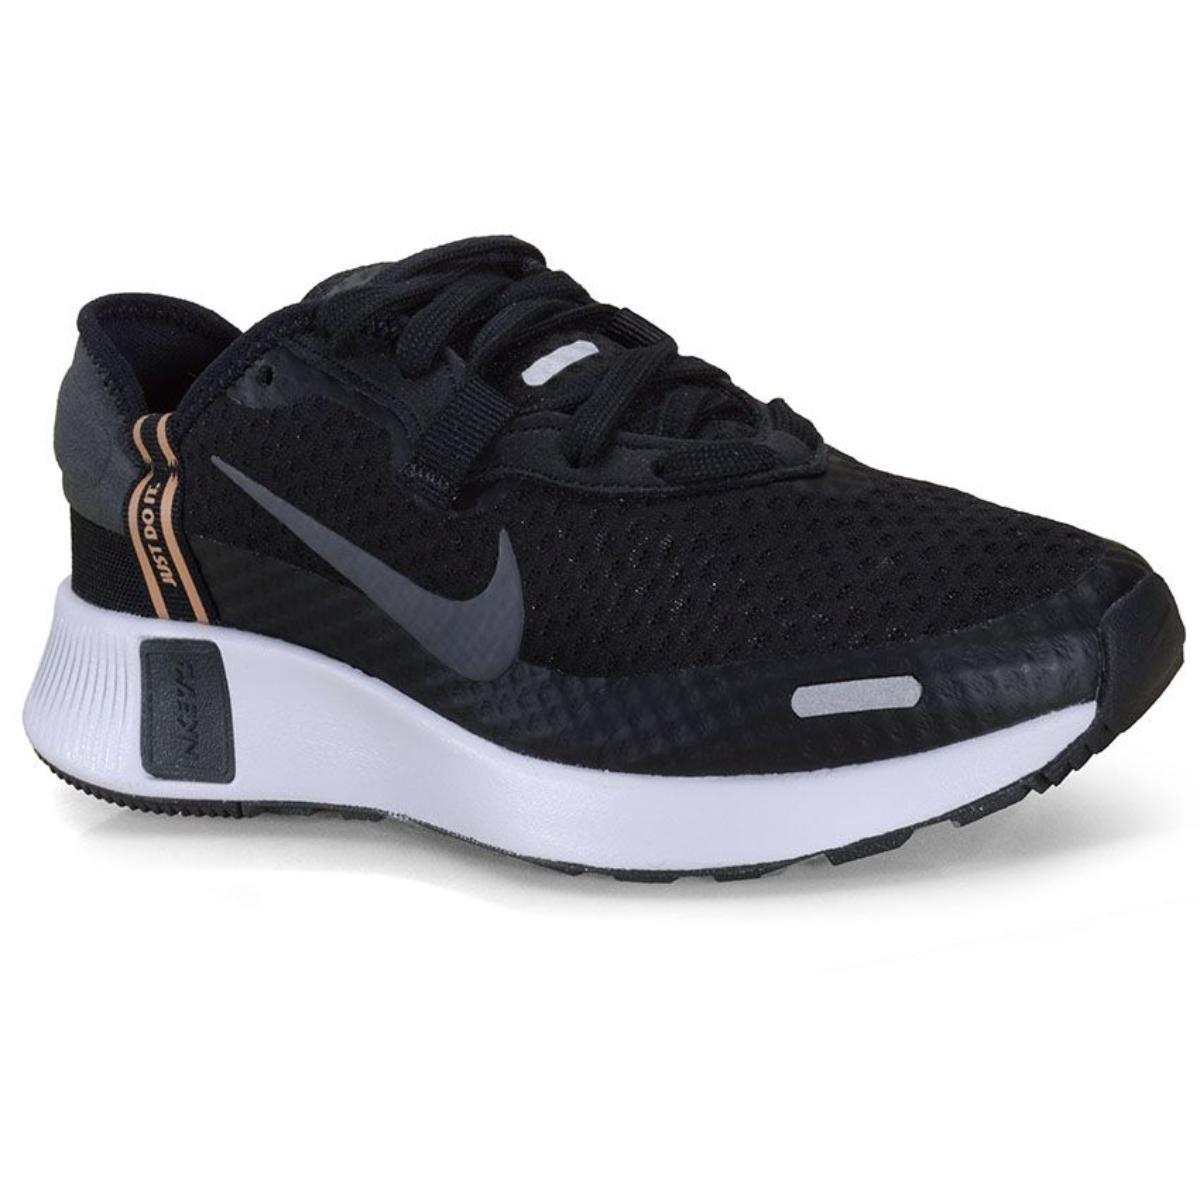 Tênis Feminino Nike Cz5630-002 Reposto Preto